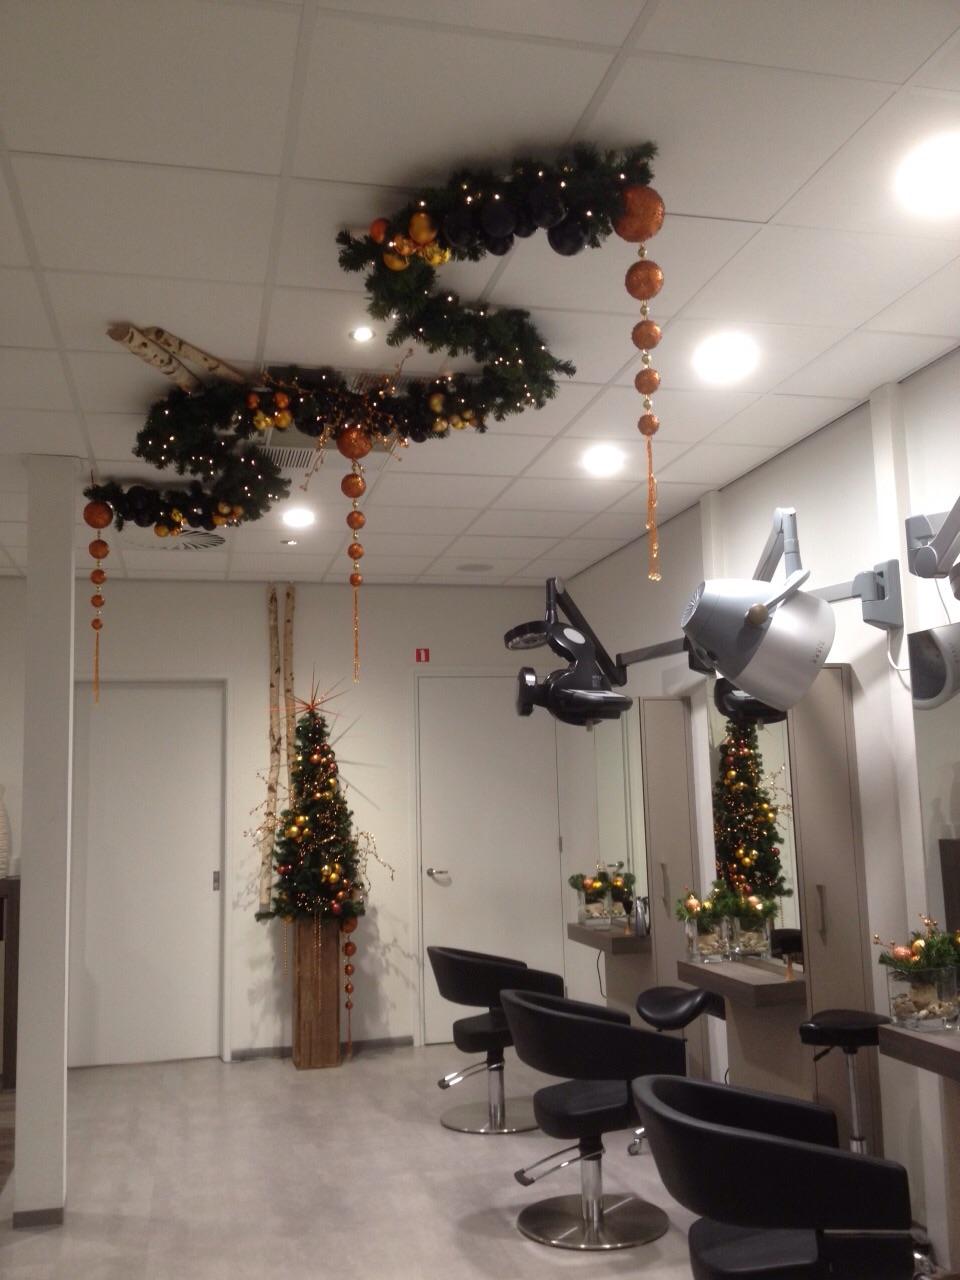 Plafond decoratie rich art design etaleur kerst - Decoratie epuree salon ...